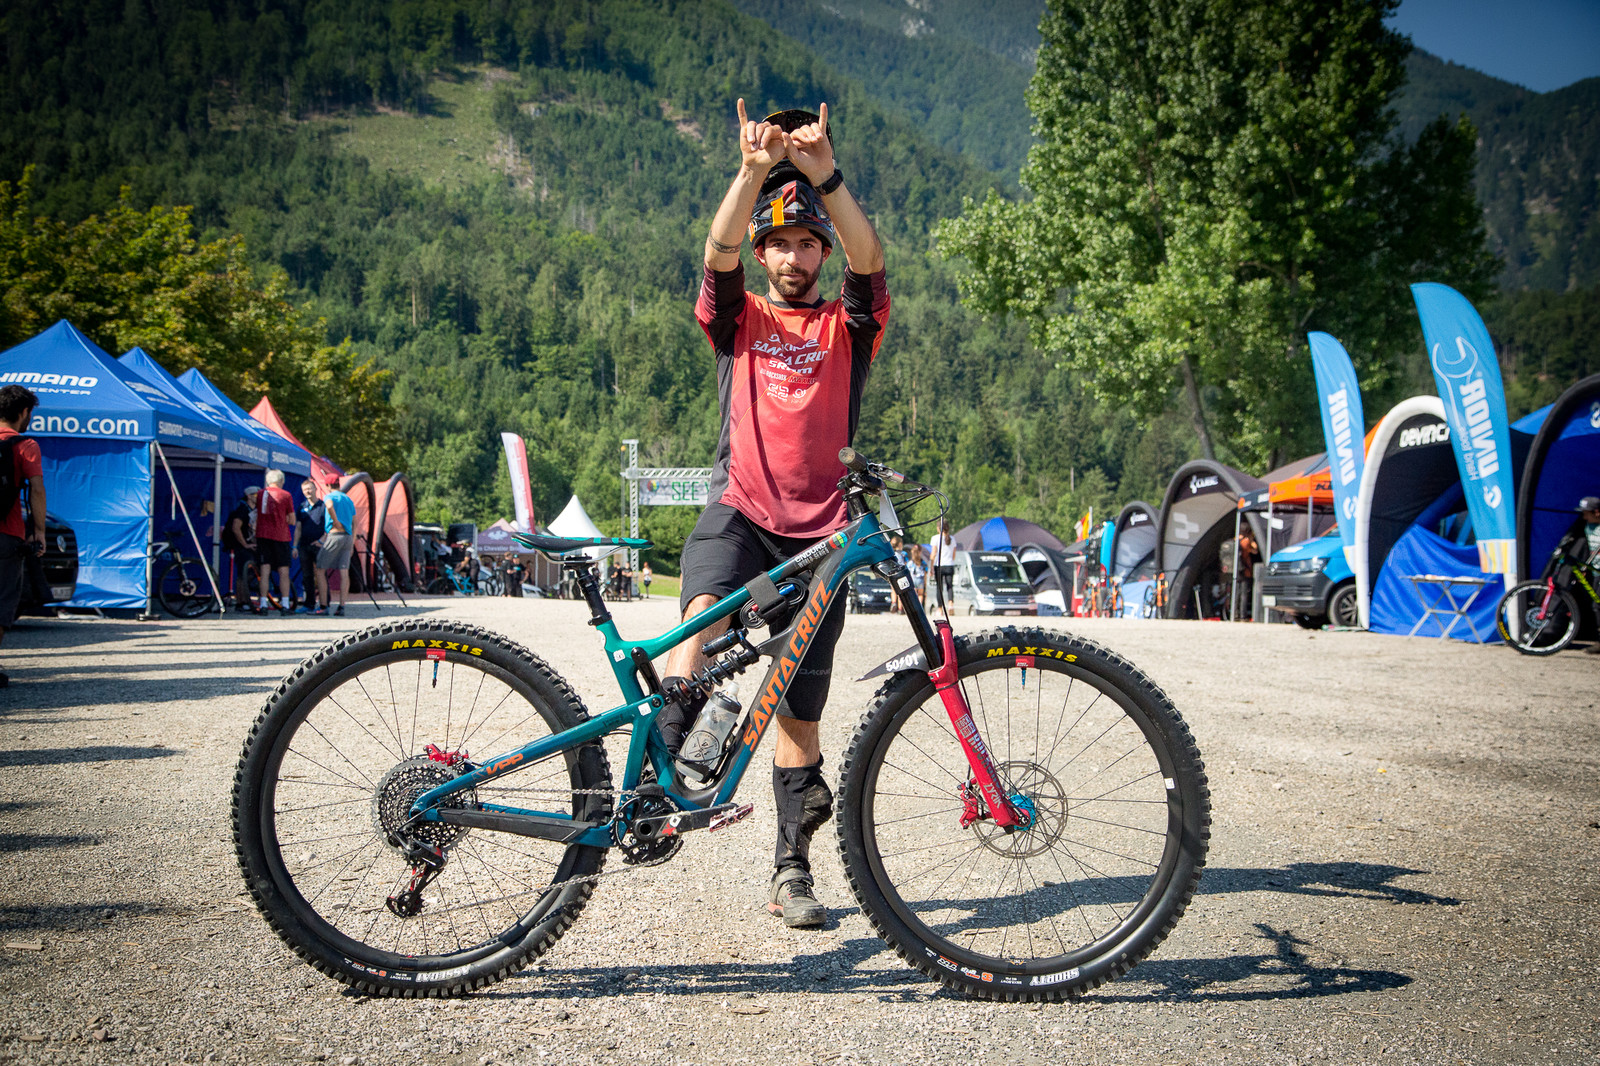 Iago Garay's Santa Cruz Hightower LT - PIT BITS - Enduro World Series, Petzen - Mountain Biking Pictures - Vital MTB